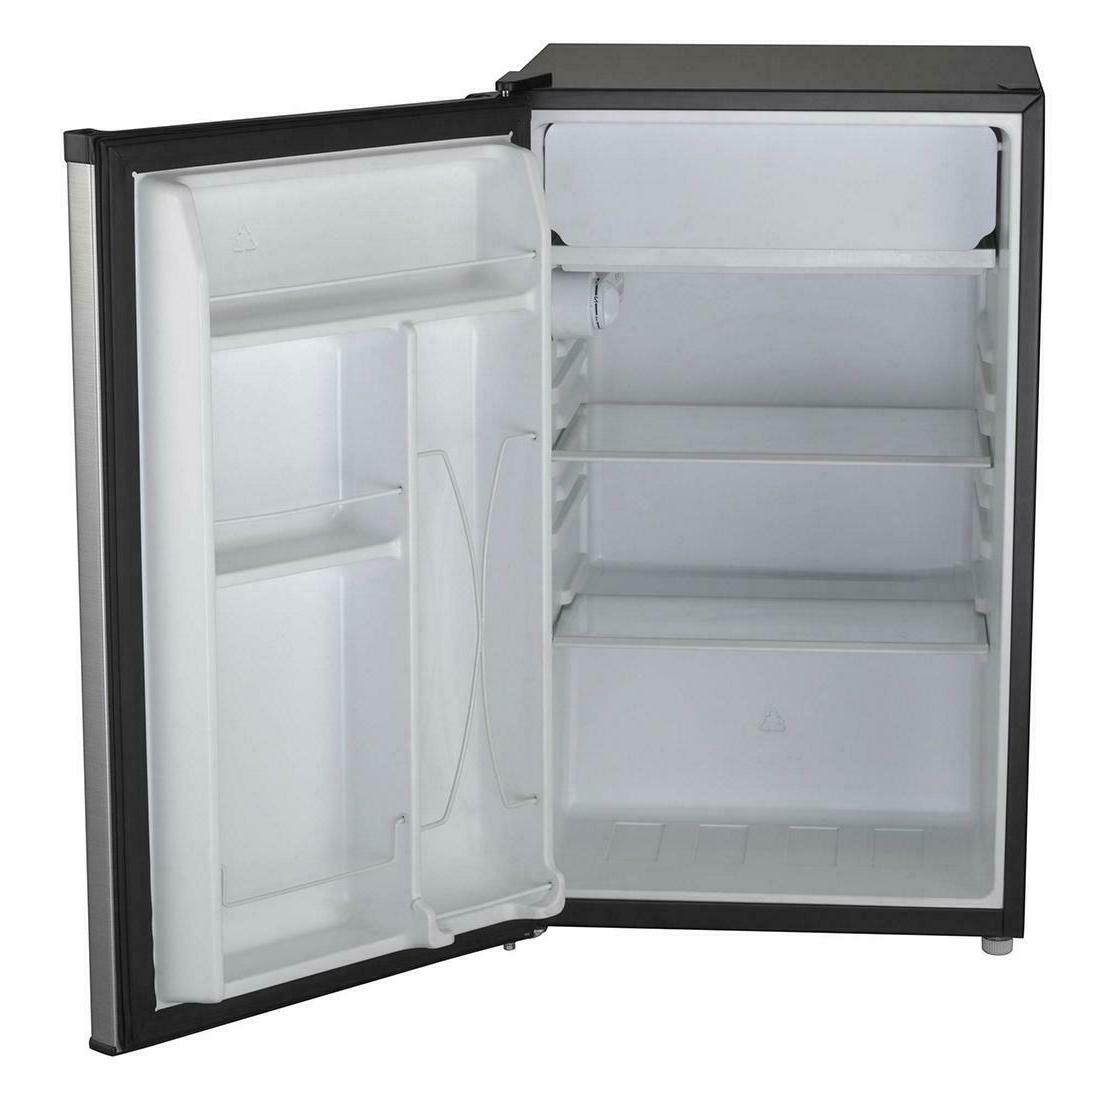 Compact Fridge Refrigerator Stainless Dorm